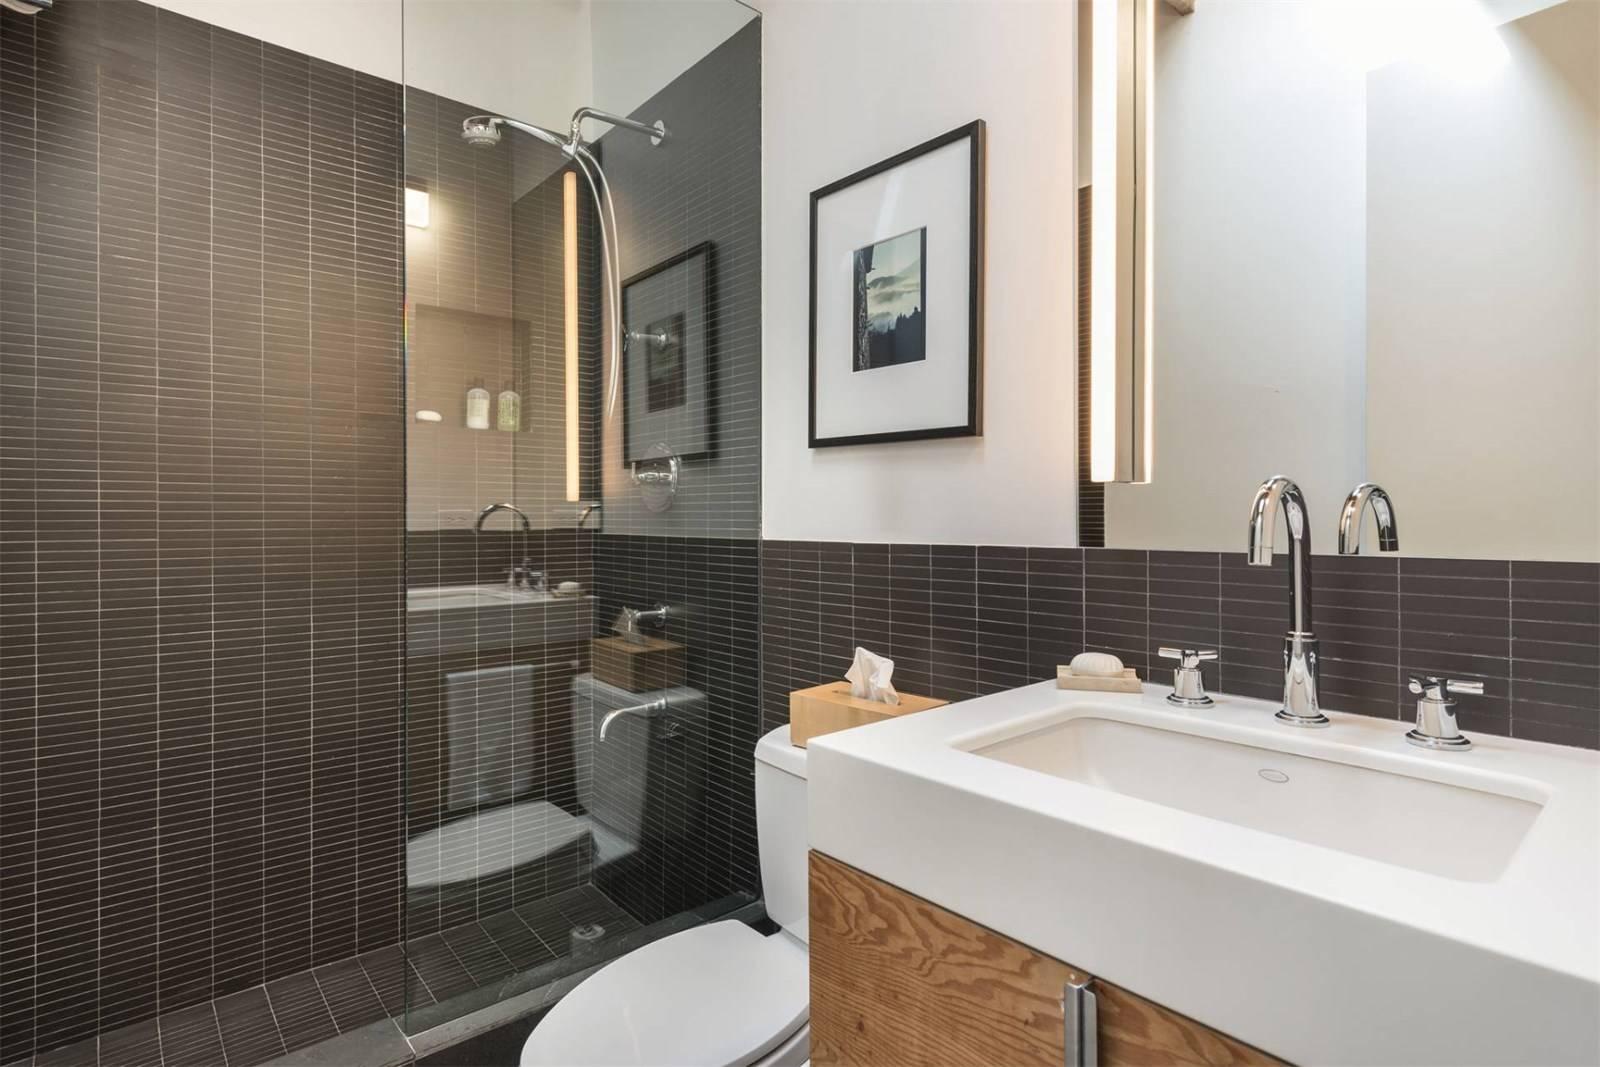 Отделка ванной в квартире новостройке фото